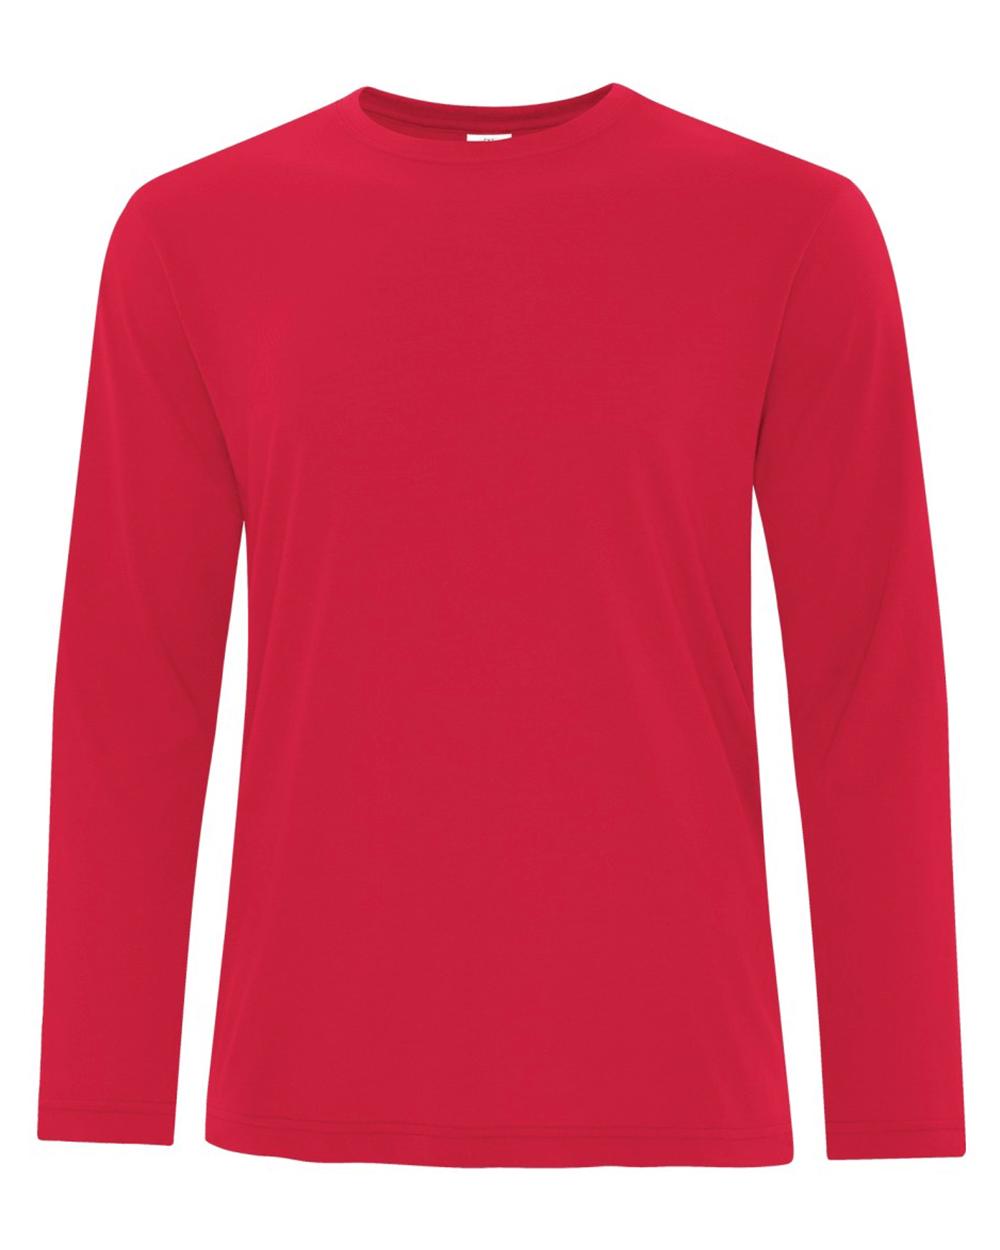 Pro Spun Longsleeve T-Shirt